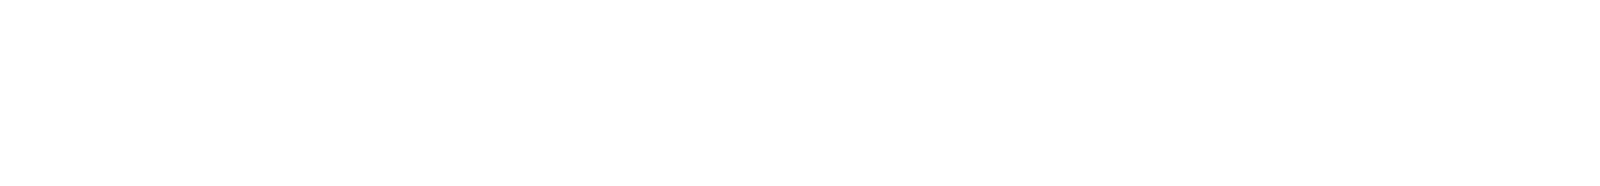 Troutband Retina Logo